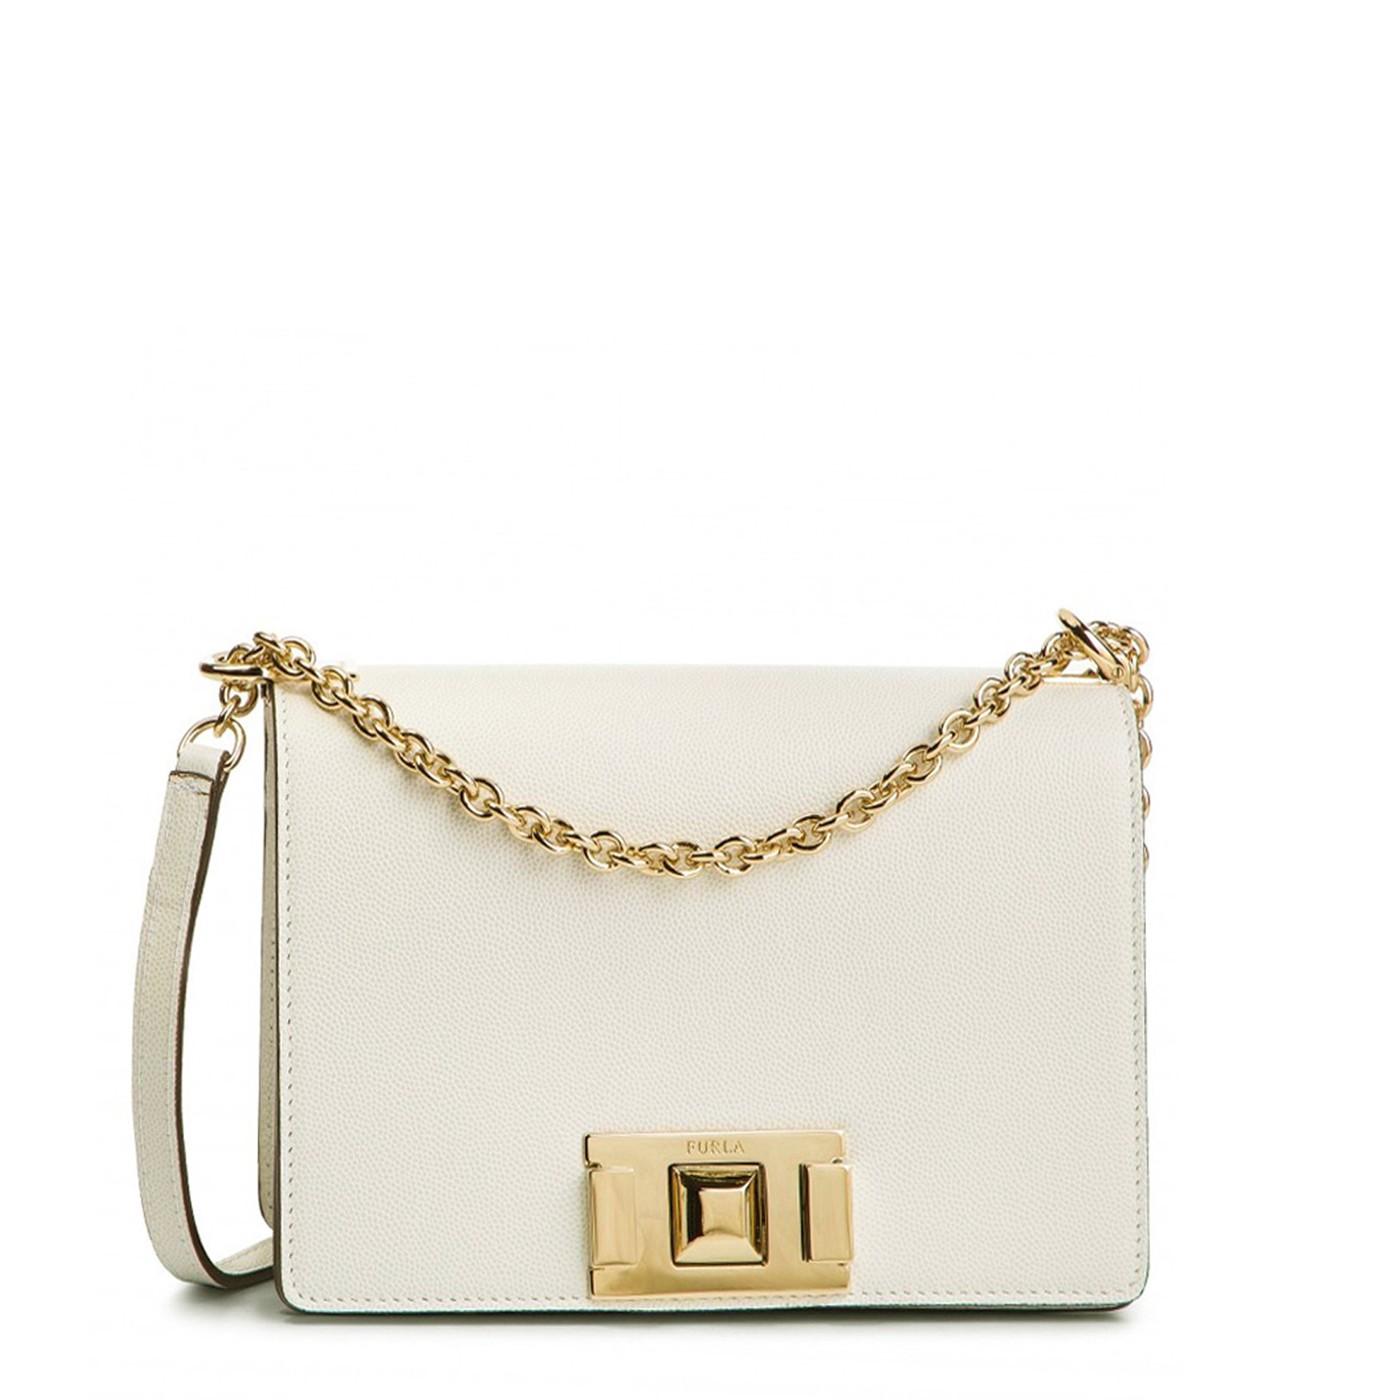 Furla Mimi White Leather Bag